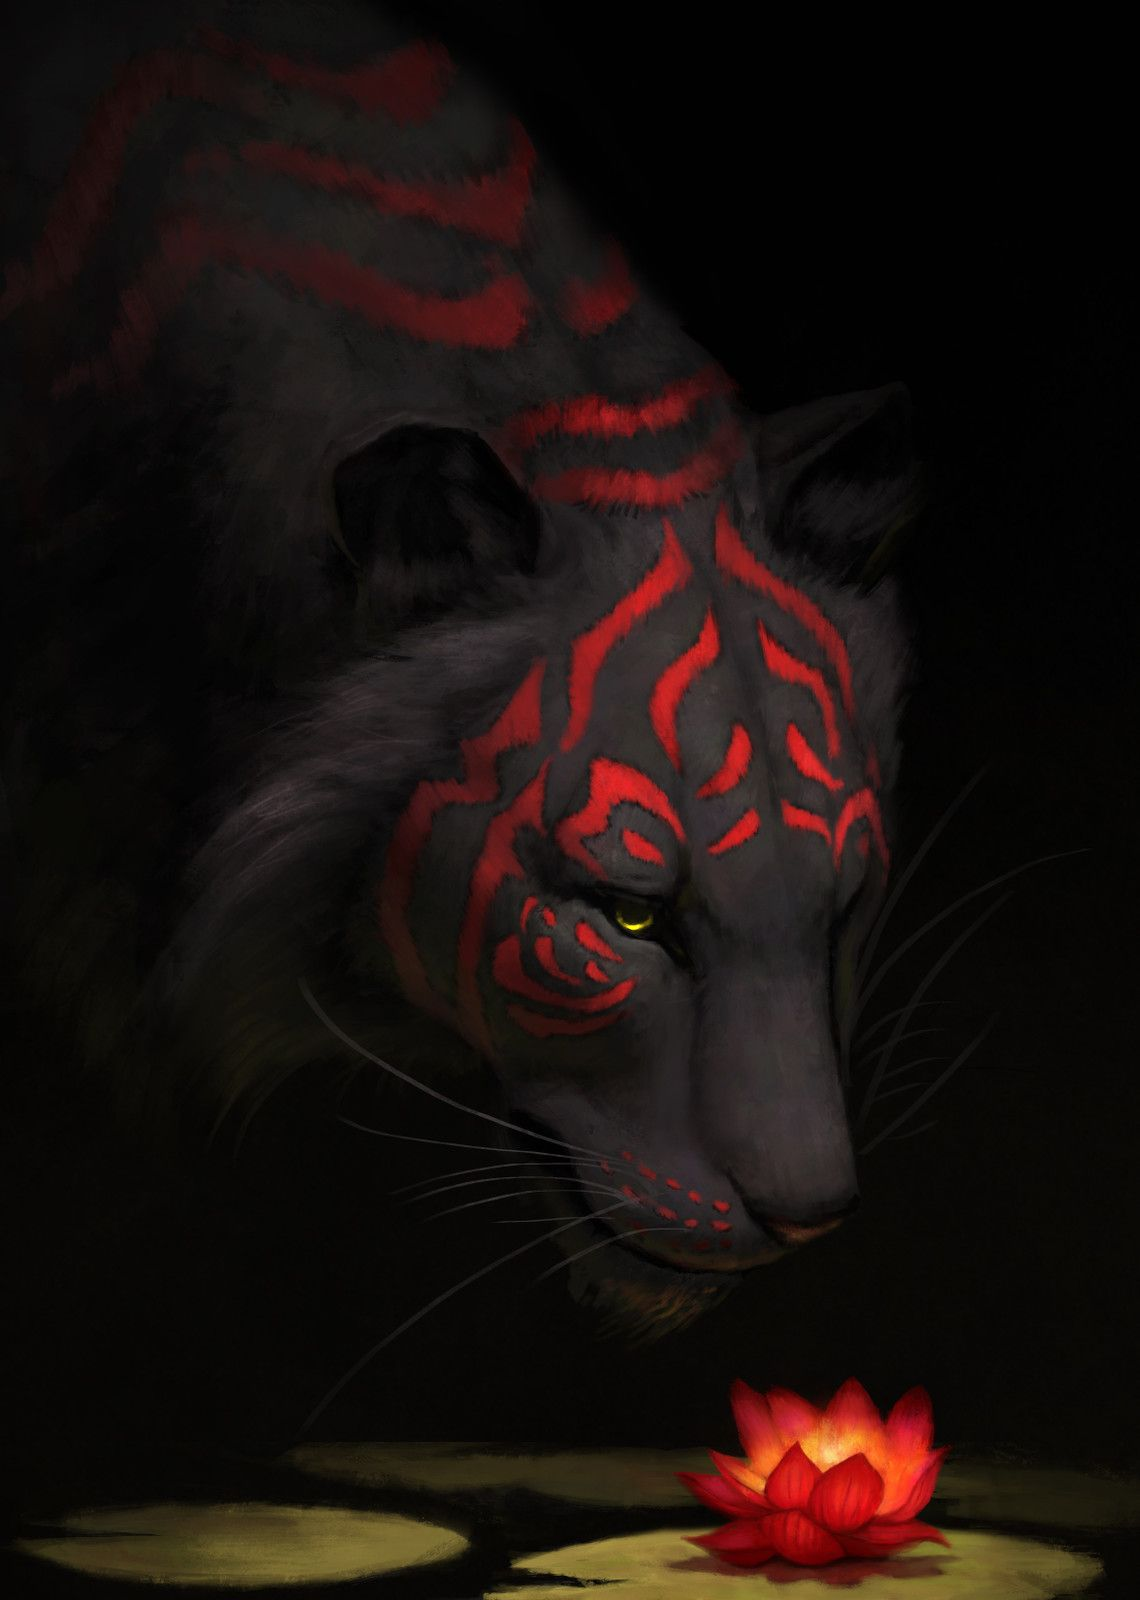 Tiger Lily, Jade Mere on ArtStation at https://www.artstation.com/artwork/l9WzO